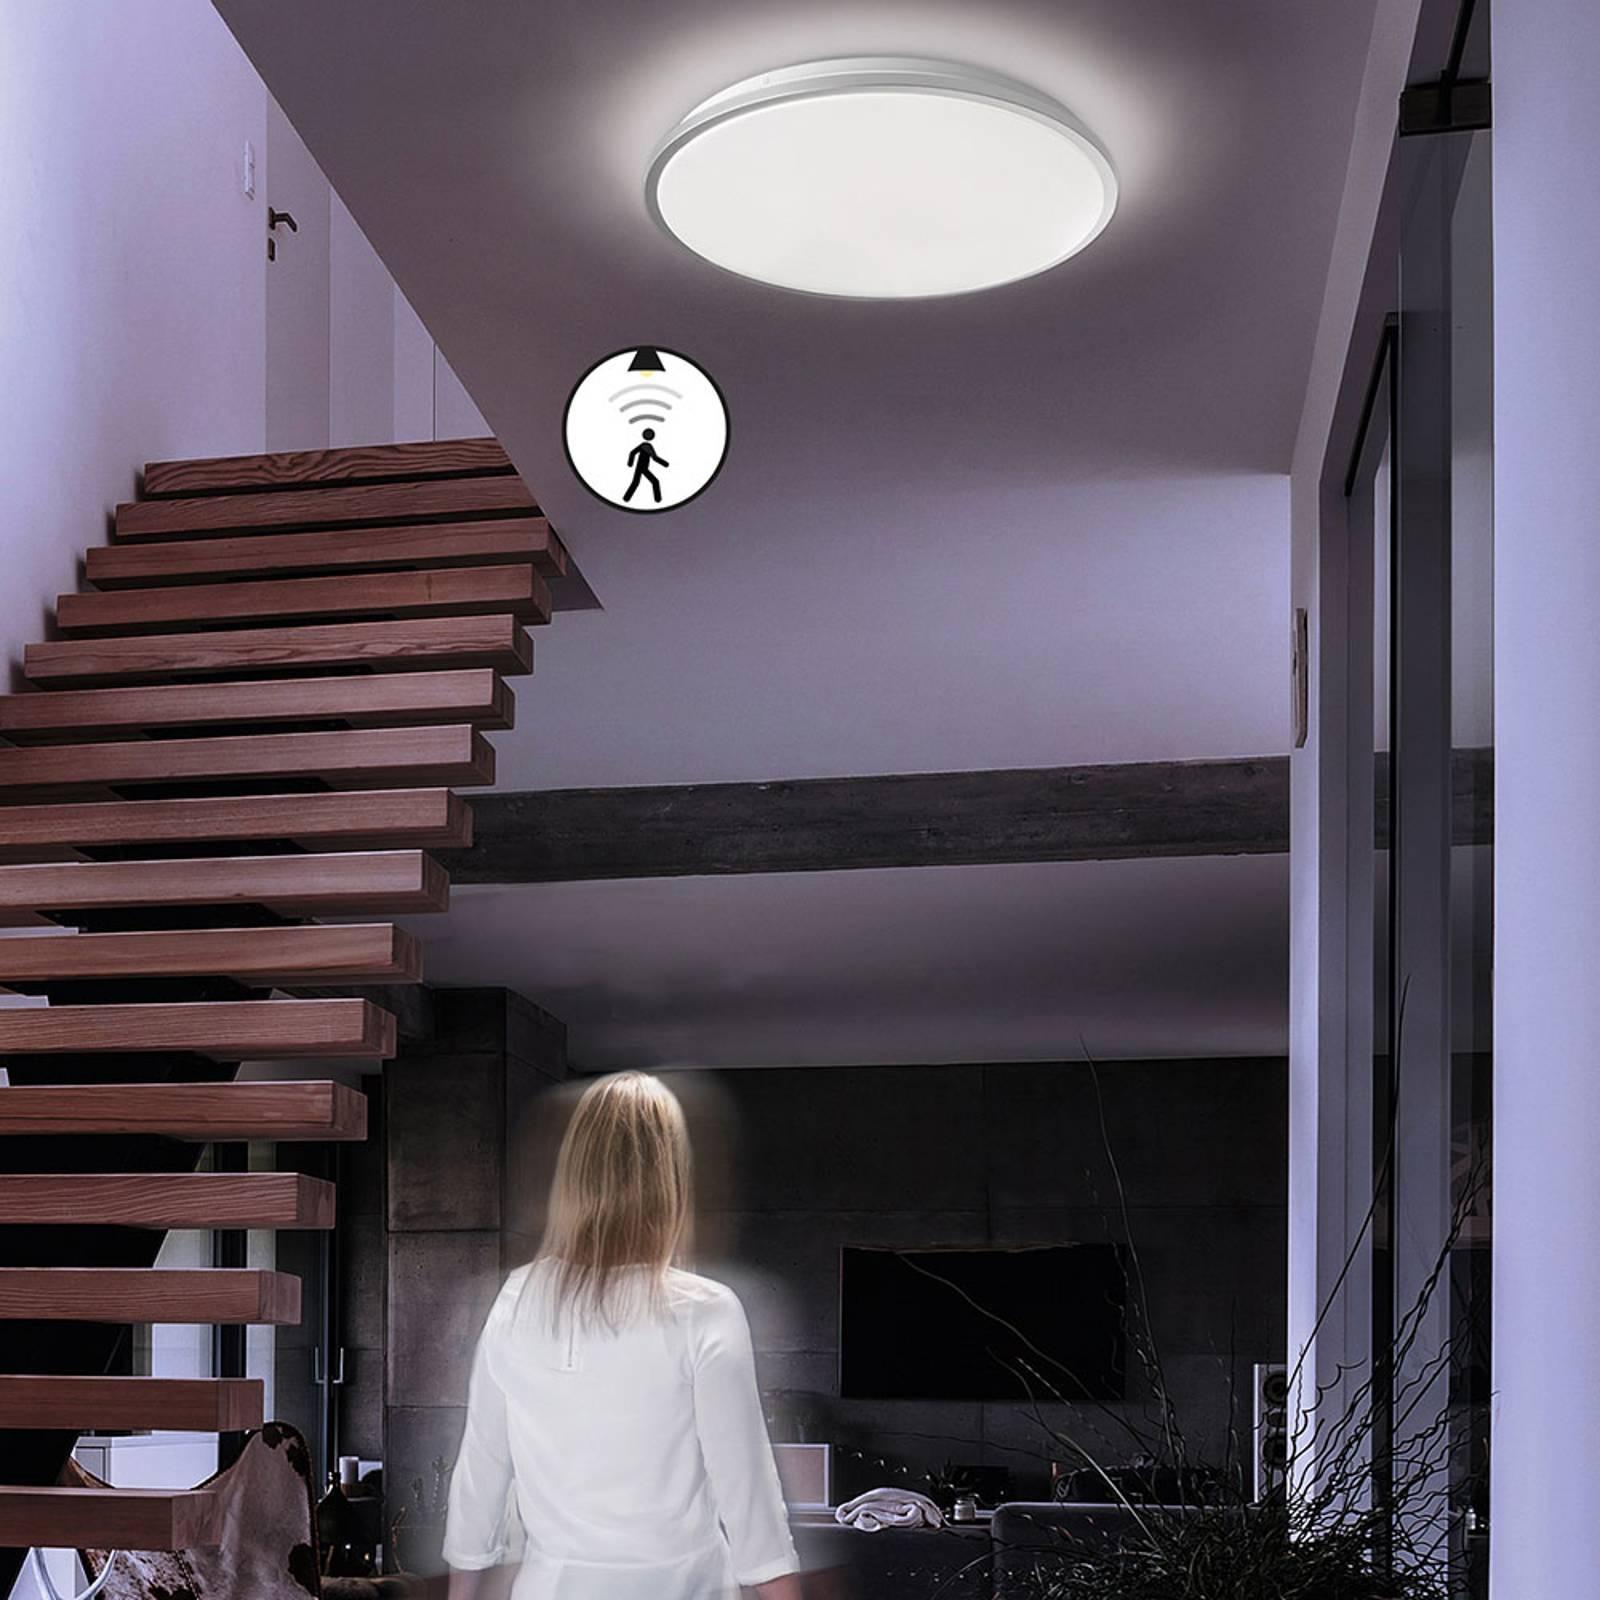 Lampa sufitowa LED Jaso BS, Ø 49 cm srebrna